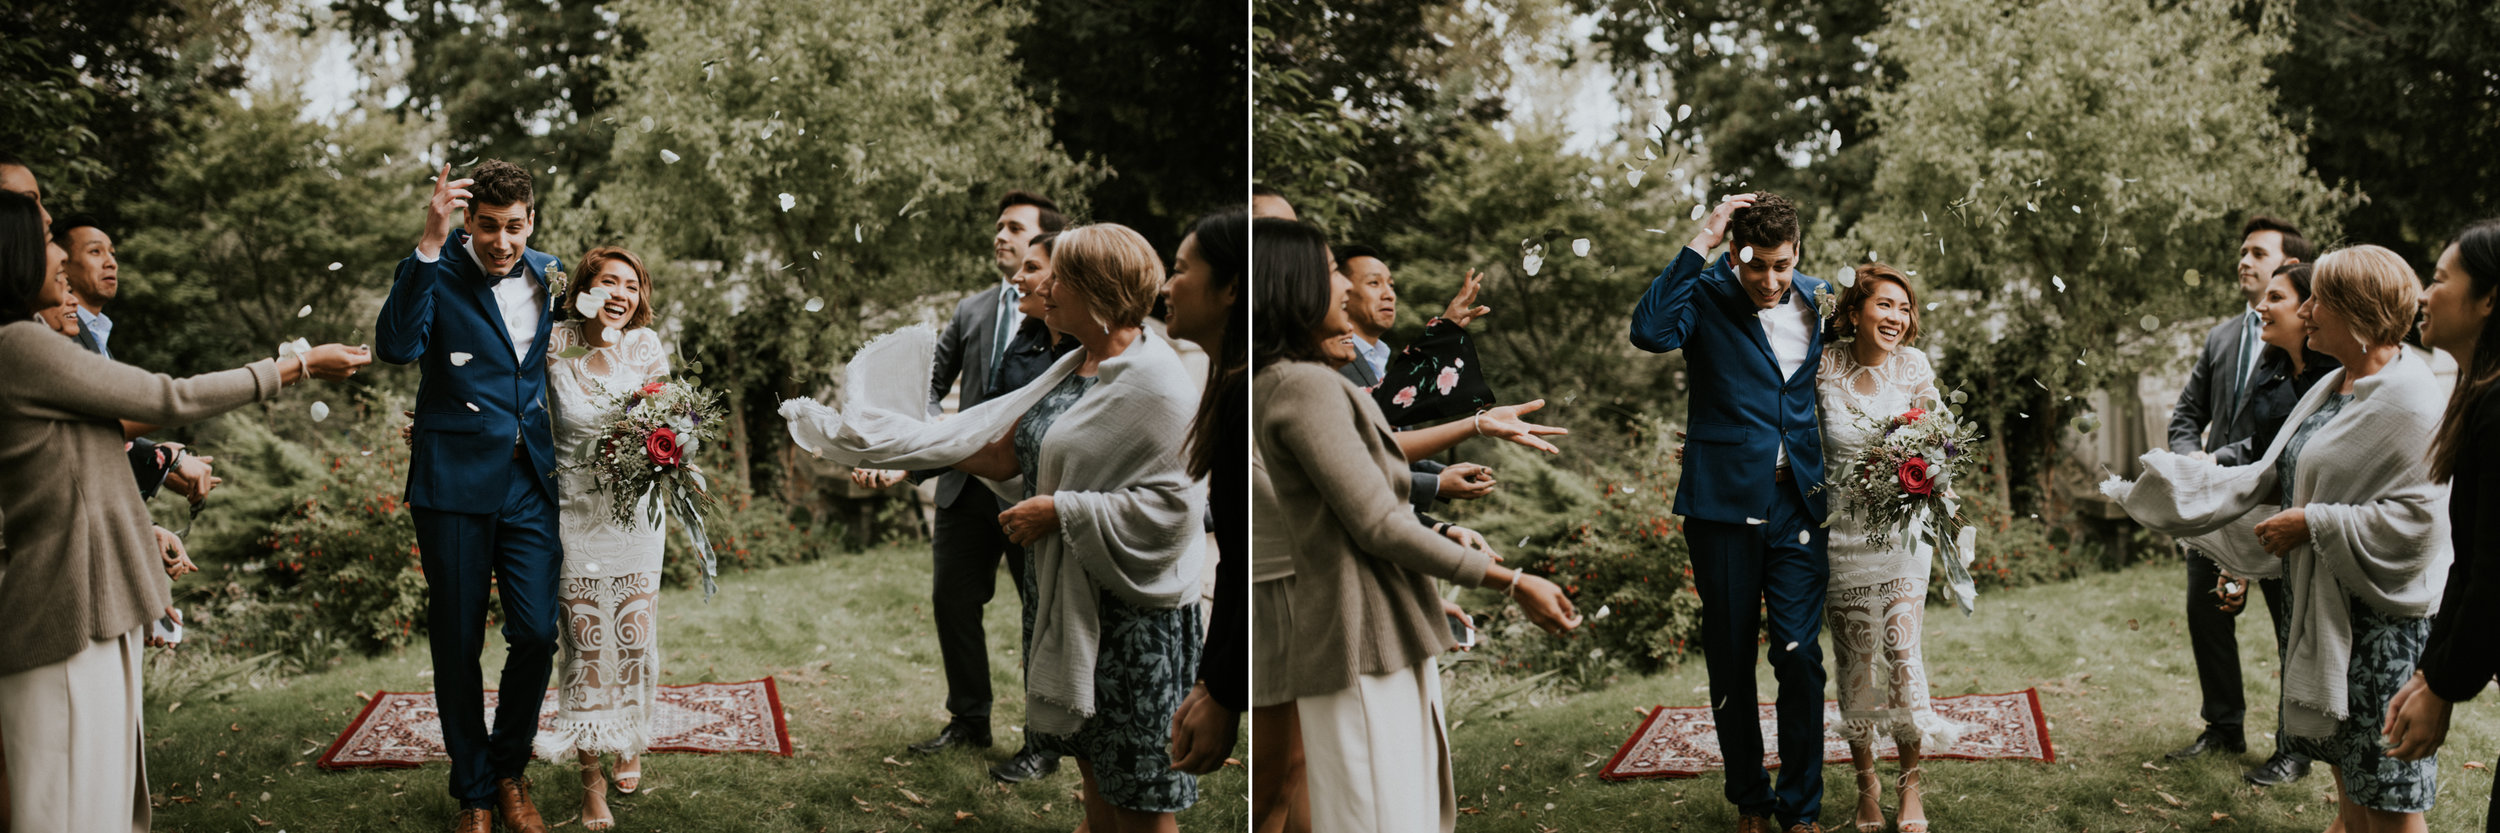 paris intimate wedding